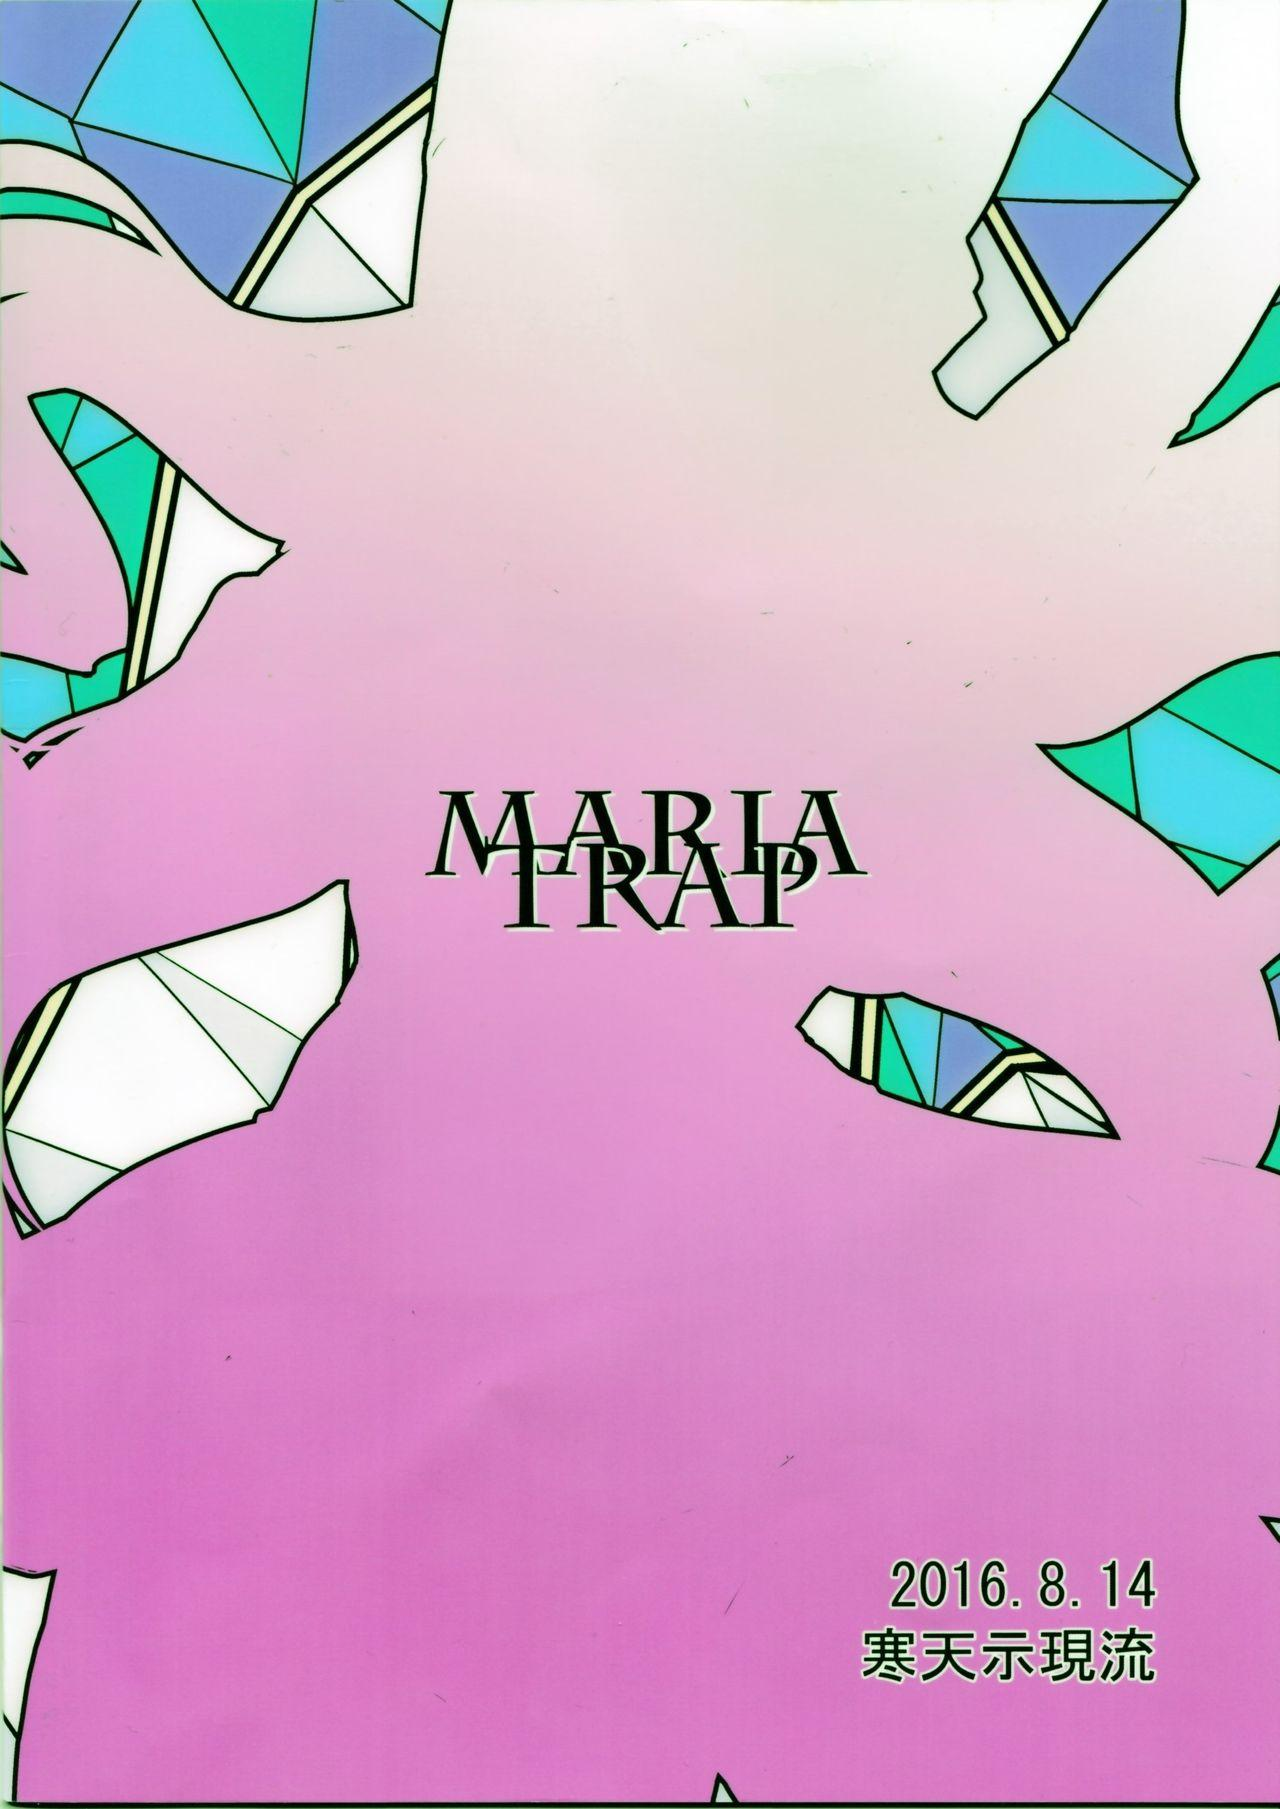 MARIA TRAP 24